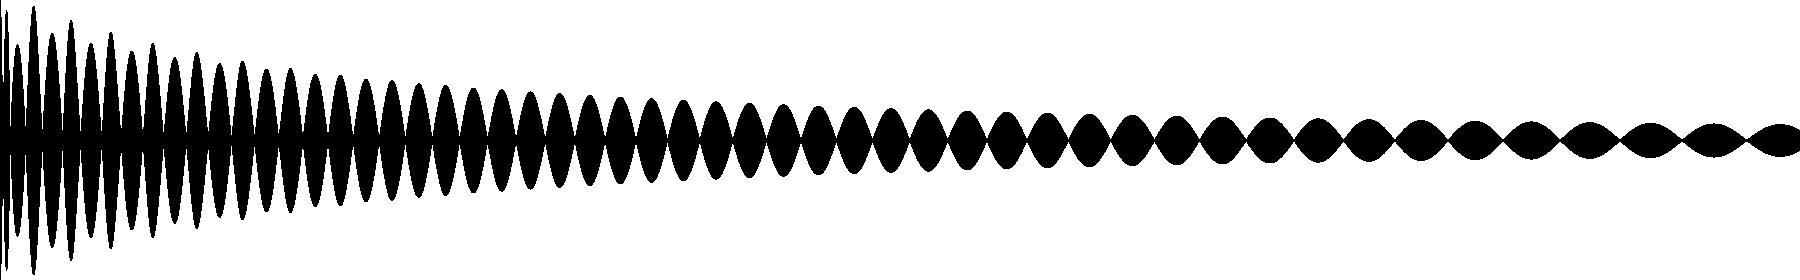 808 bd 3